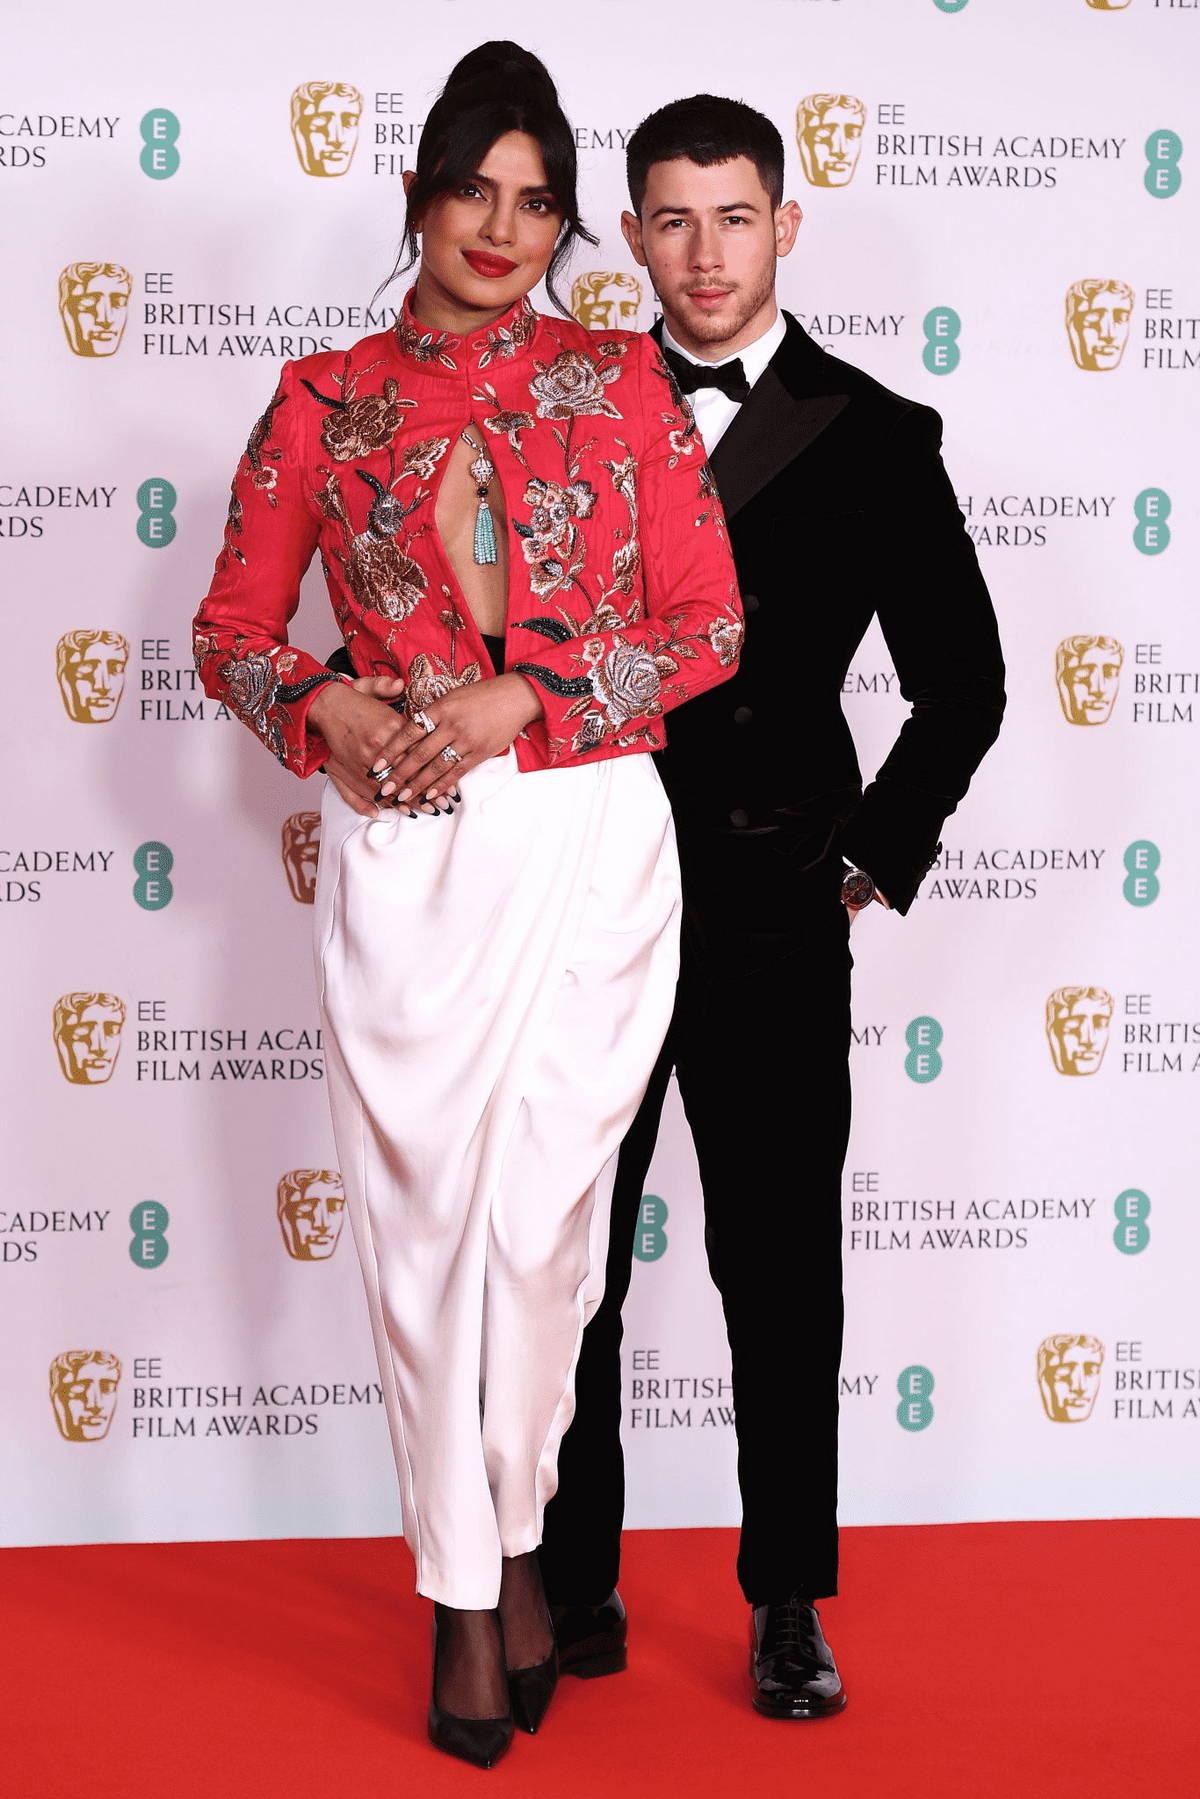 Priyanka Chopra and Nick Jonas attend the EE British Academy Film Awards 2021 at Royal Albert Hall in London, UK